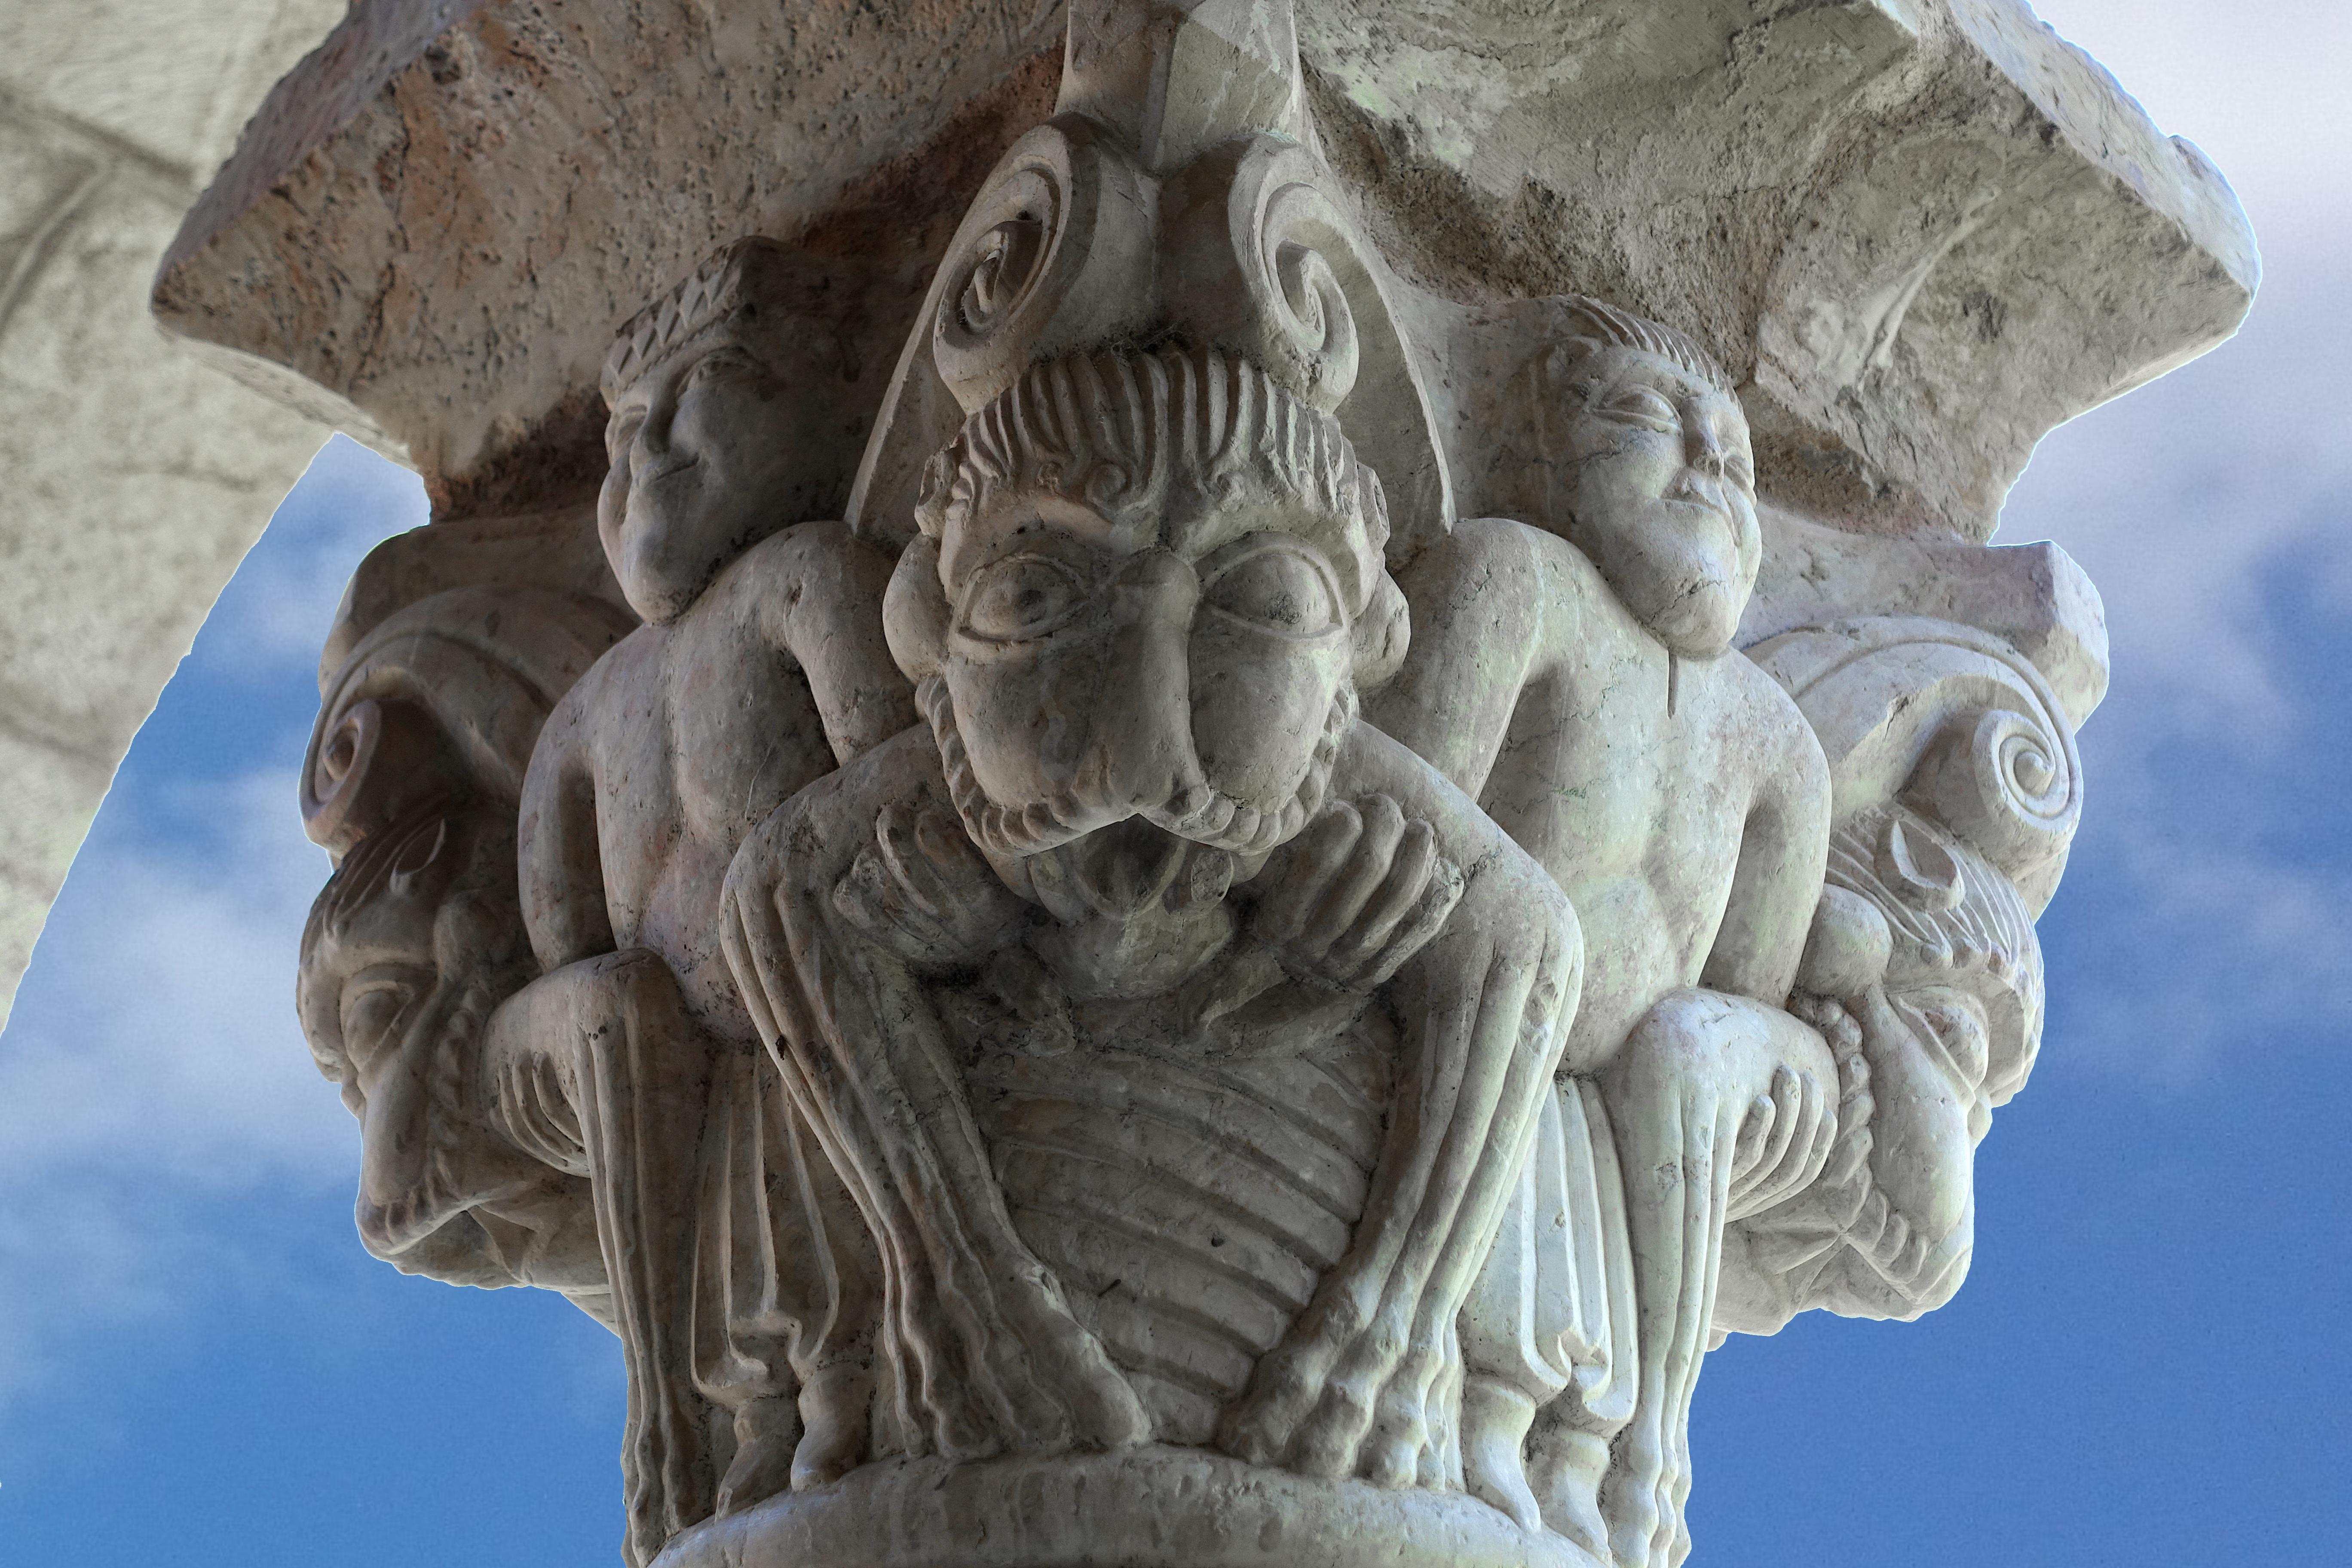 Free Images : monument, france, statue, gargoyle, sculpture ...